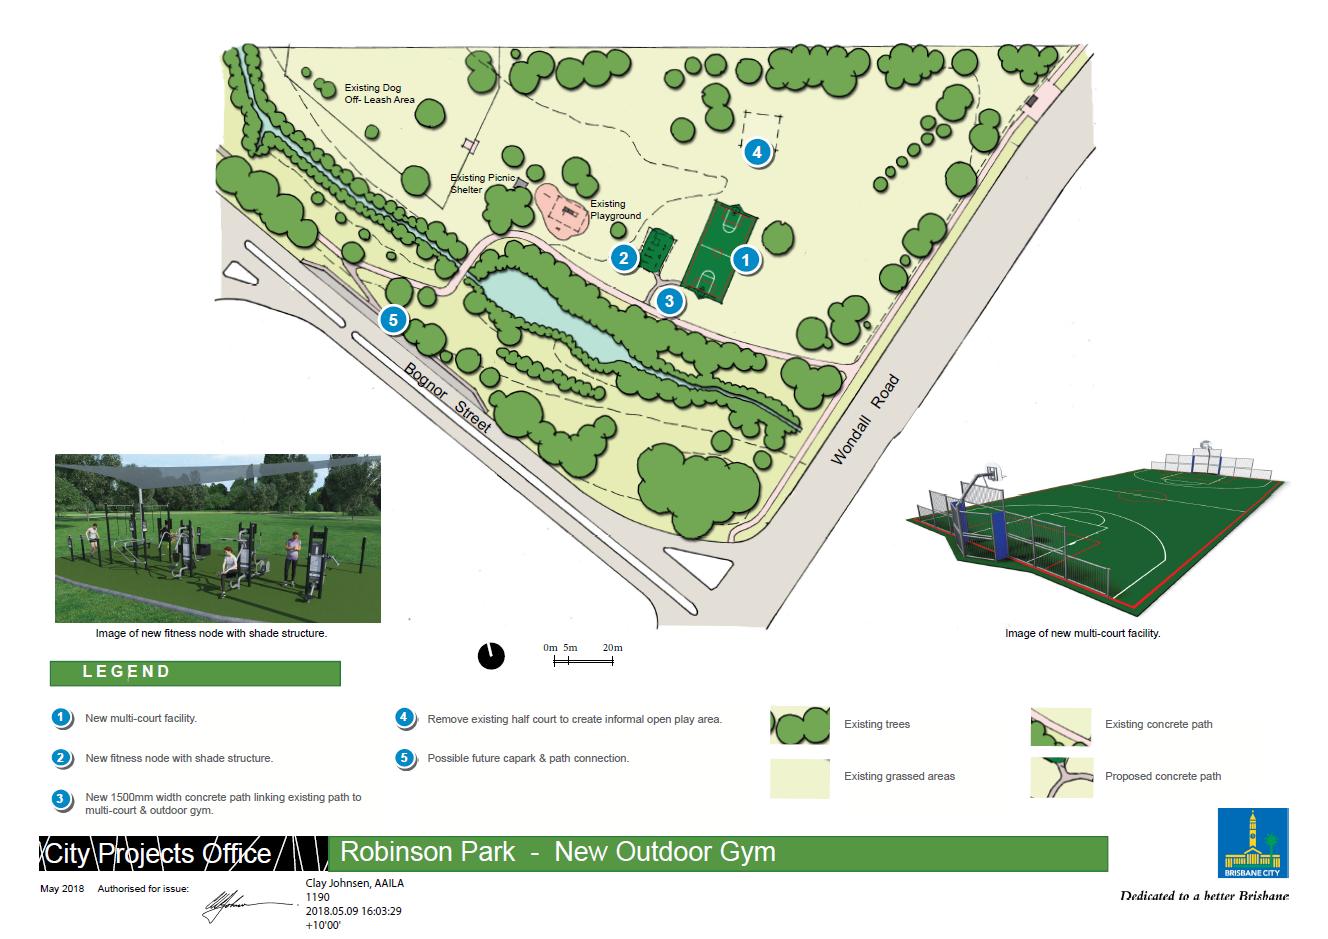 2018-05-18 13_12_29-Robinson Park - New Outdoor Gym.pdf - Adobe Acrobat Reader DC.png